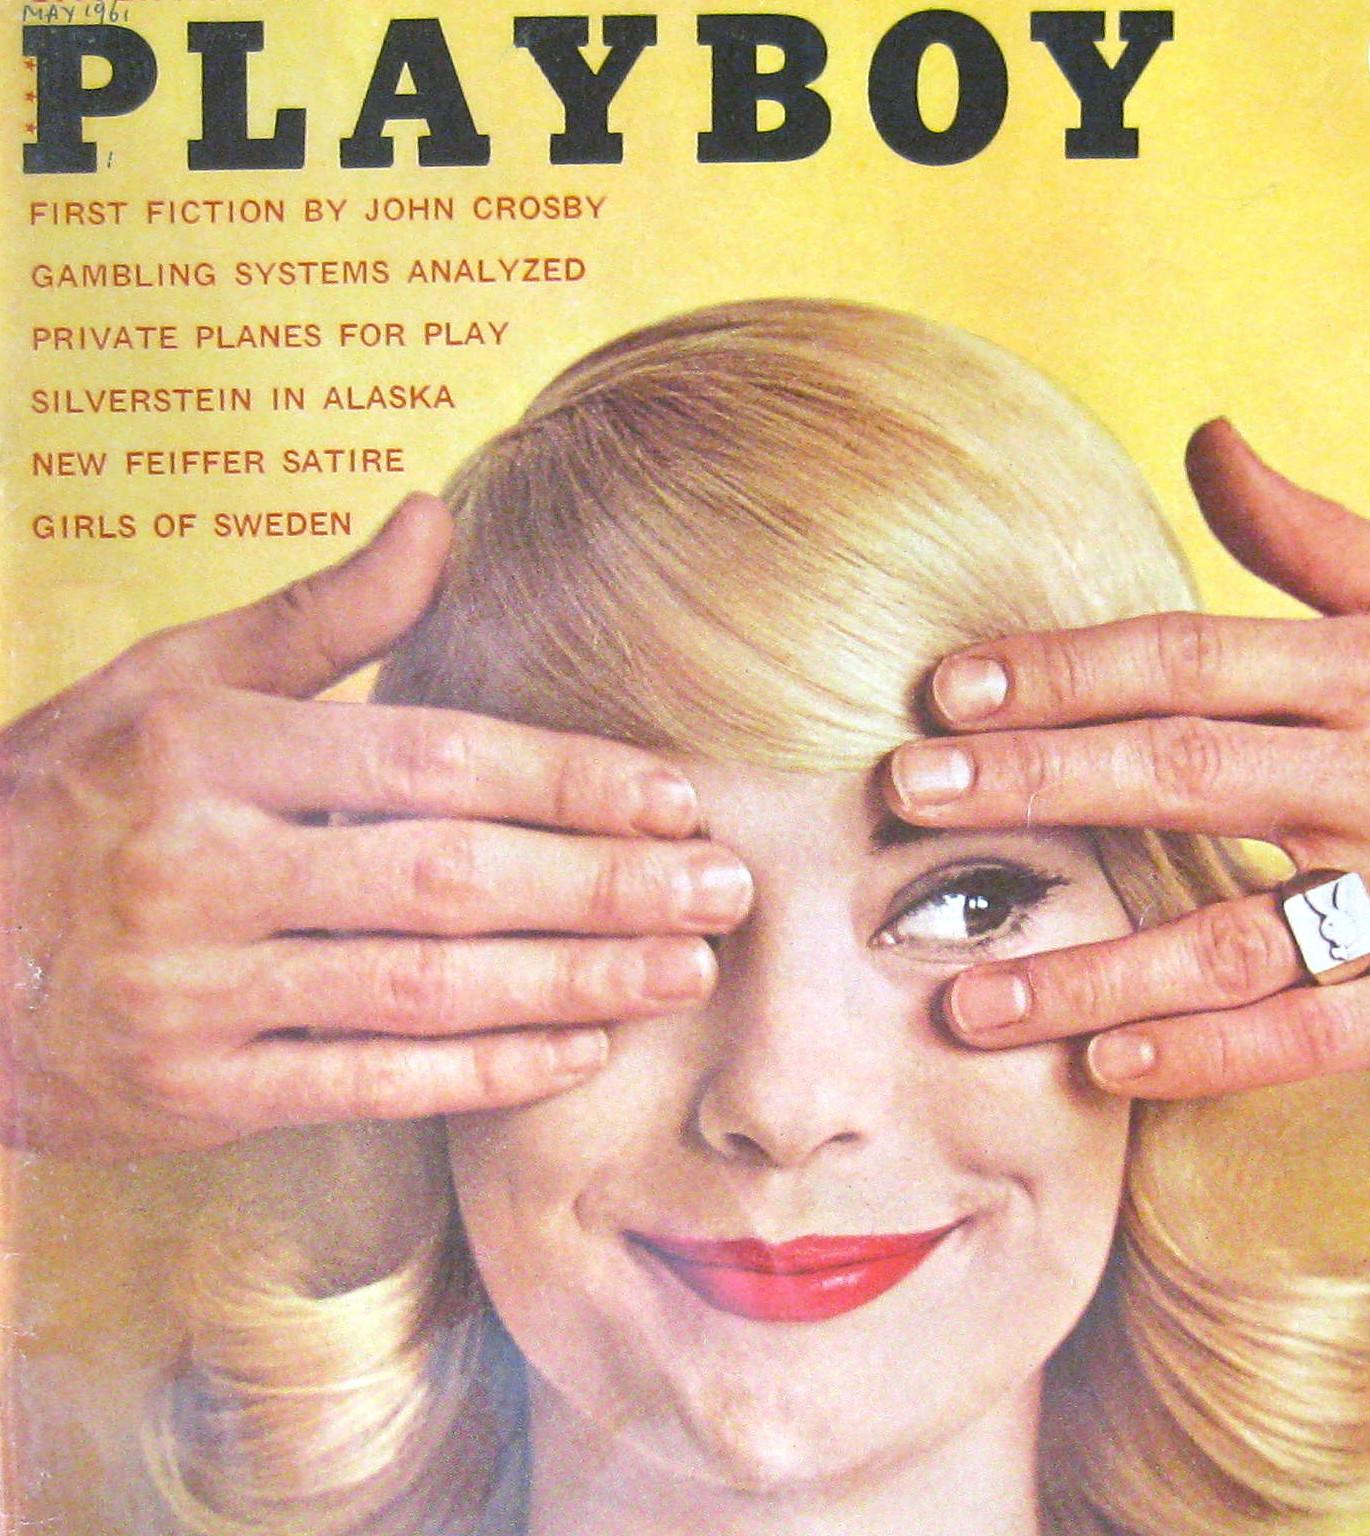 playboy magazines vintage 1960's - Retro Active : Retro Active